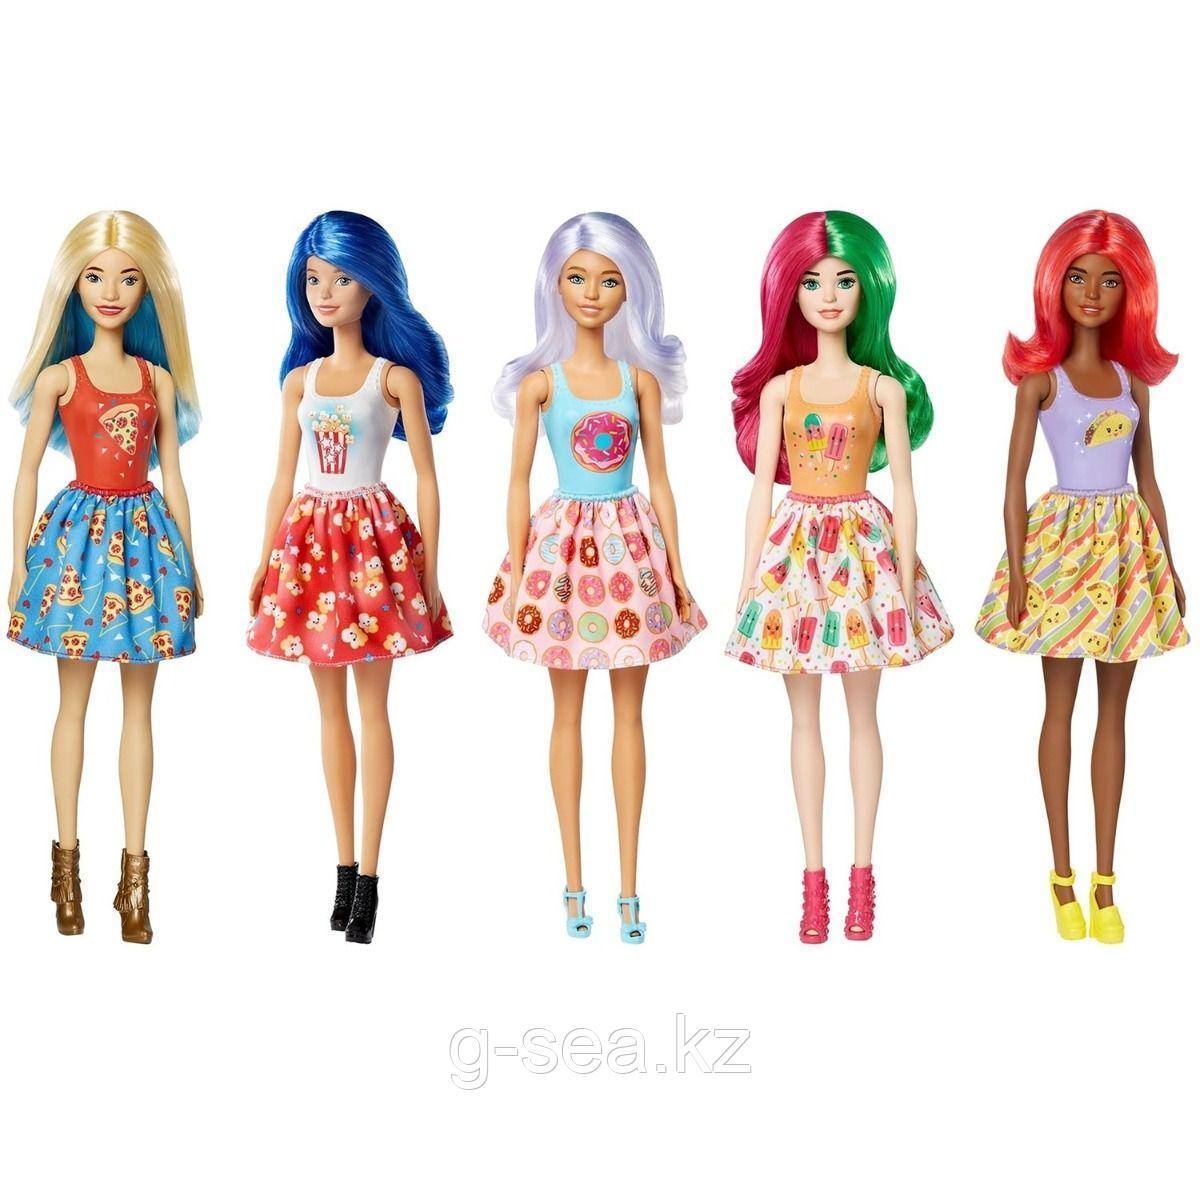 Barbie: Color reveal _2020: Кукла Barbie Colour Reveal 2 волна, в асс.